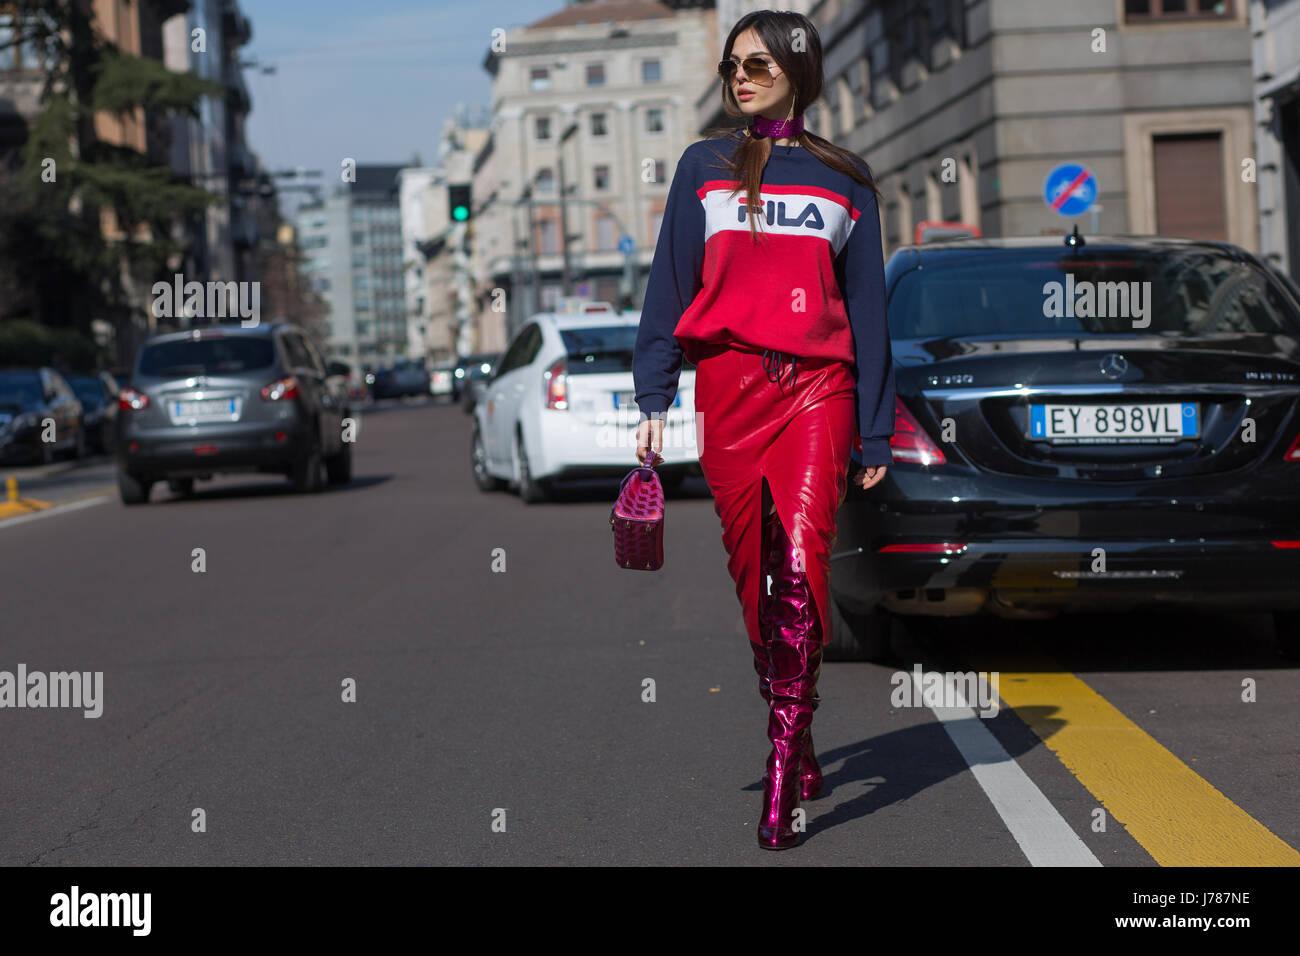 Doina Ciobanu on the streets of Milan during the Milan Fashion Week Fall/Winter 2017 - Stock Image